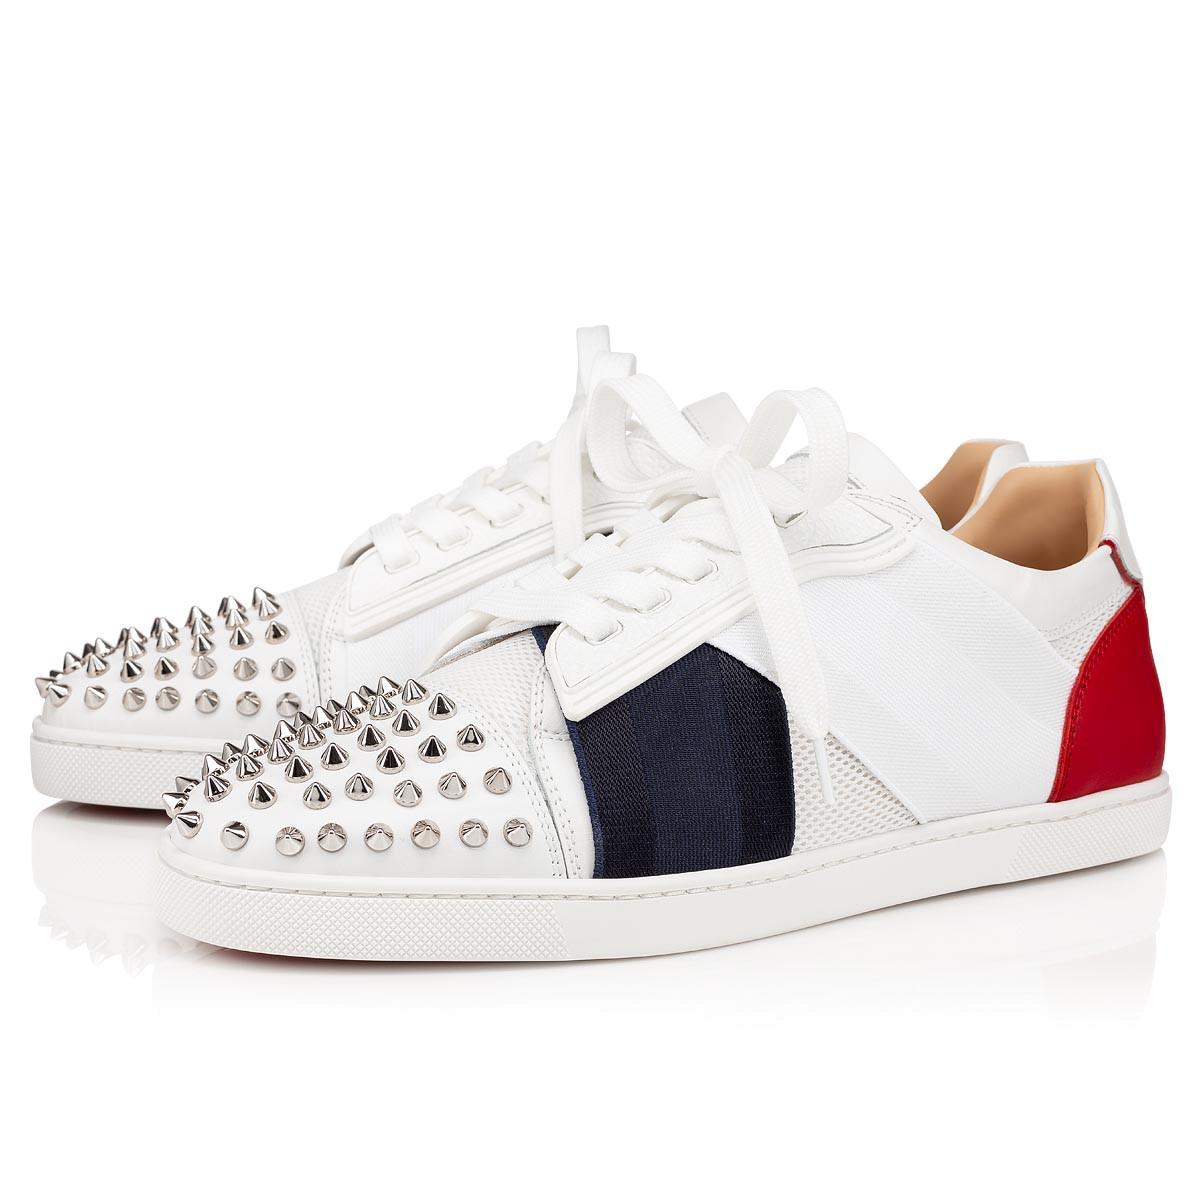 Women Shoes - Elastikid Spikes Donna - Christian Louboutin